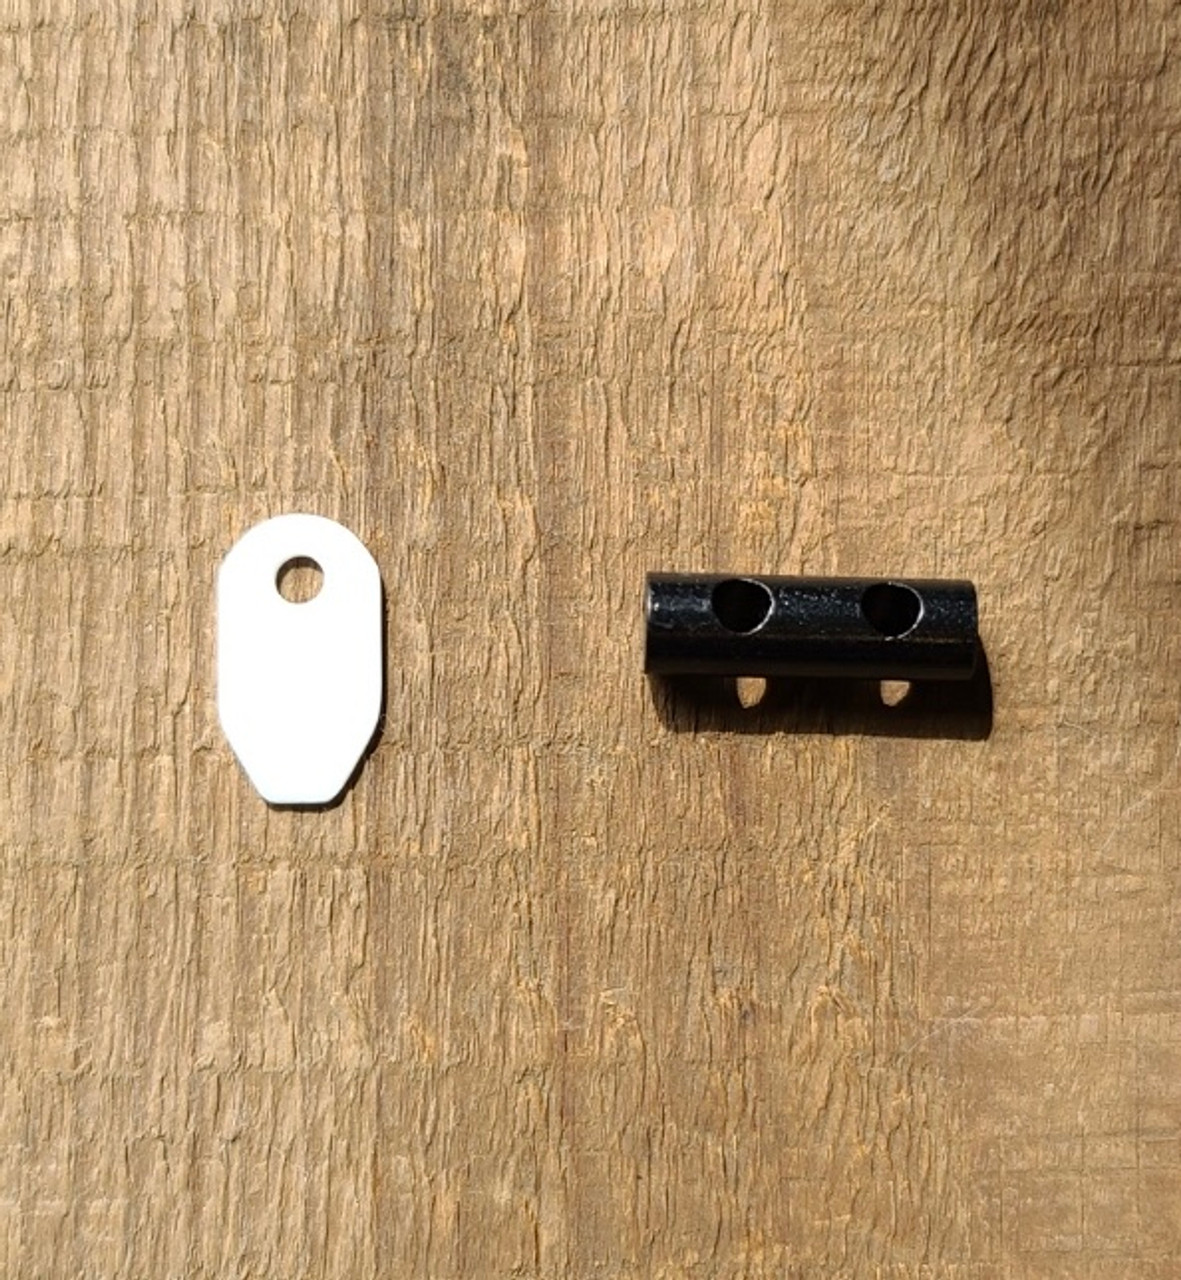 DIY Firesteel Necklace Kit (White)